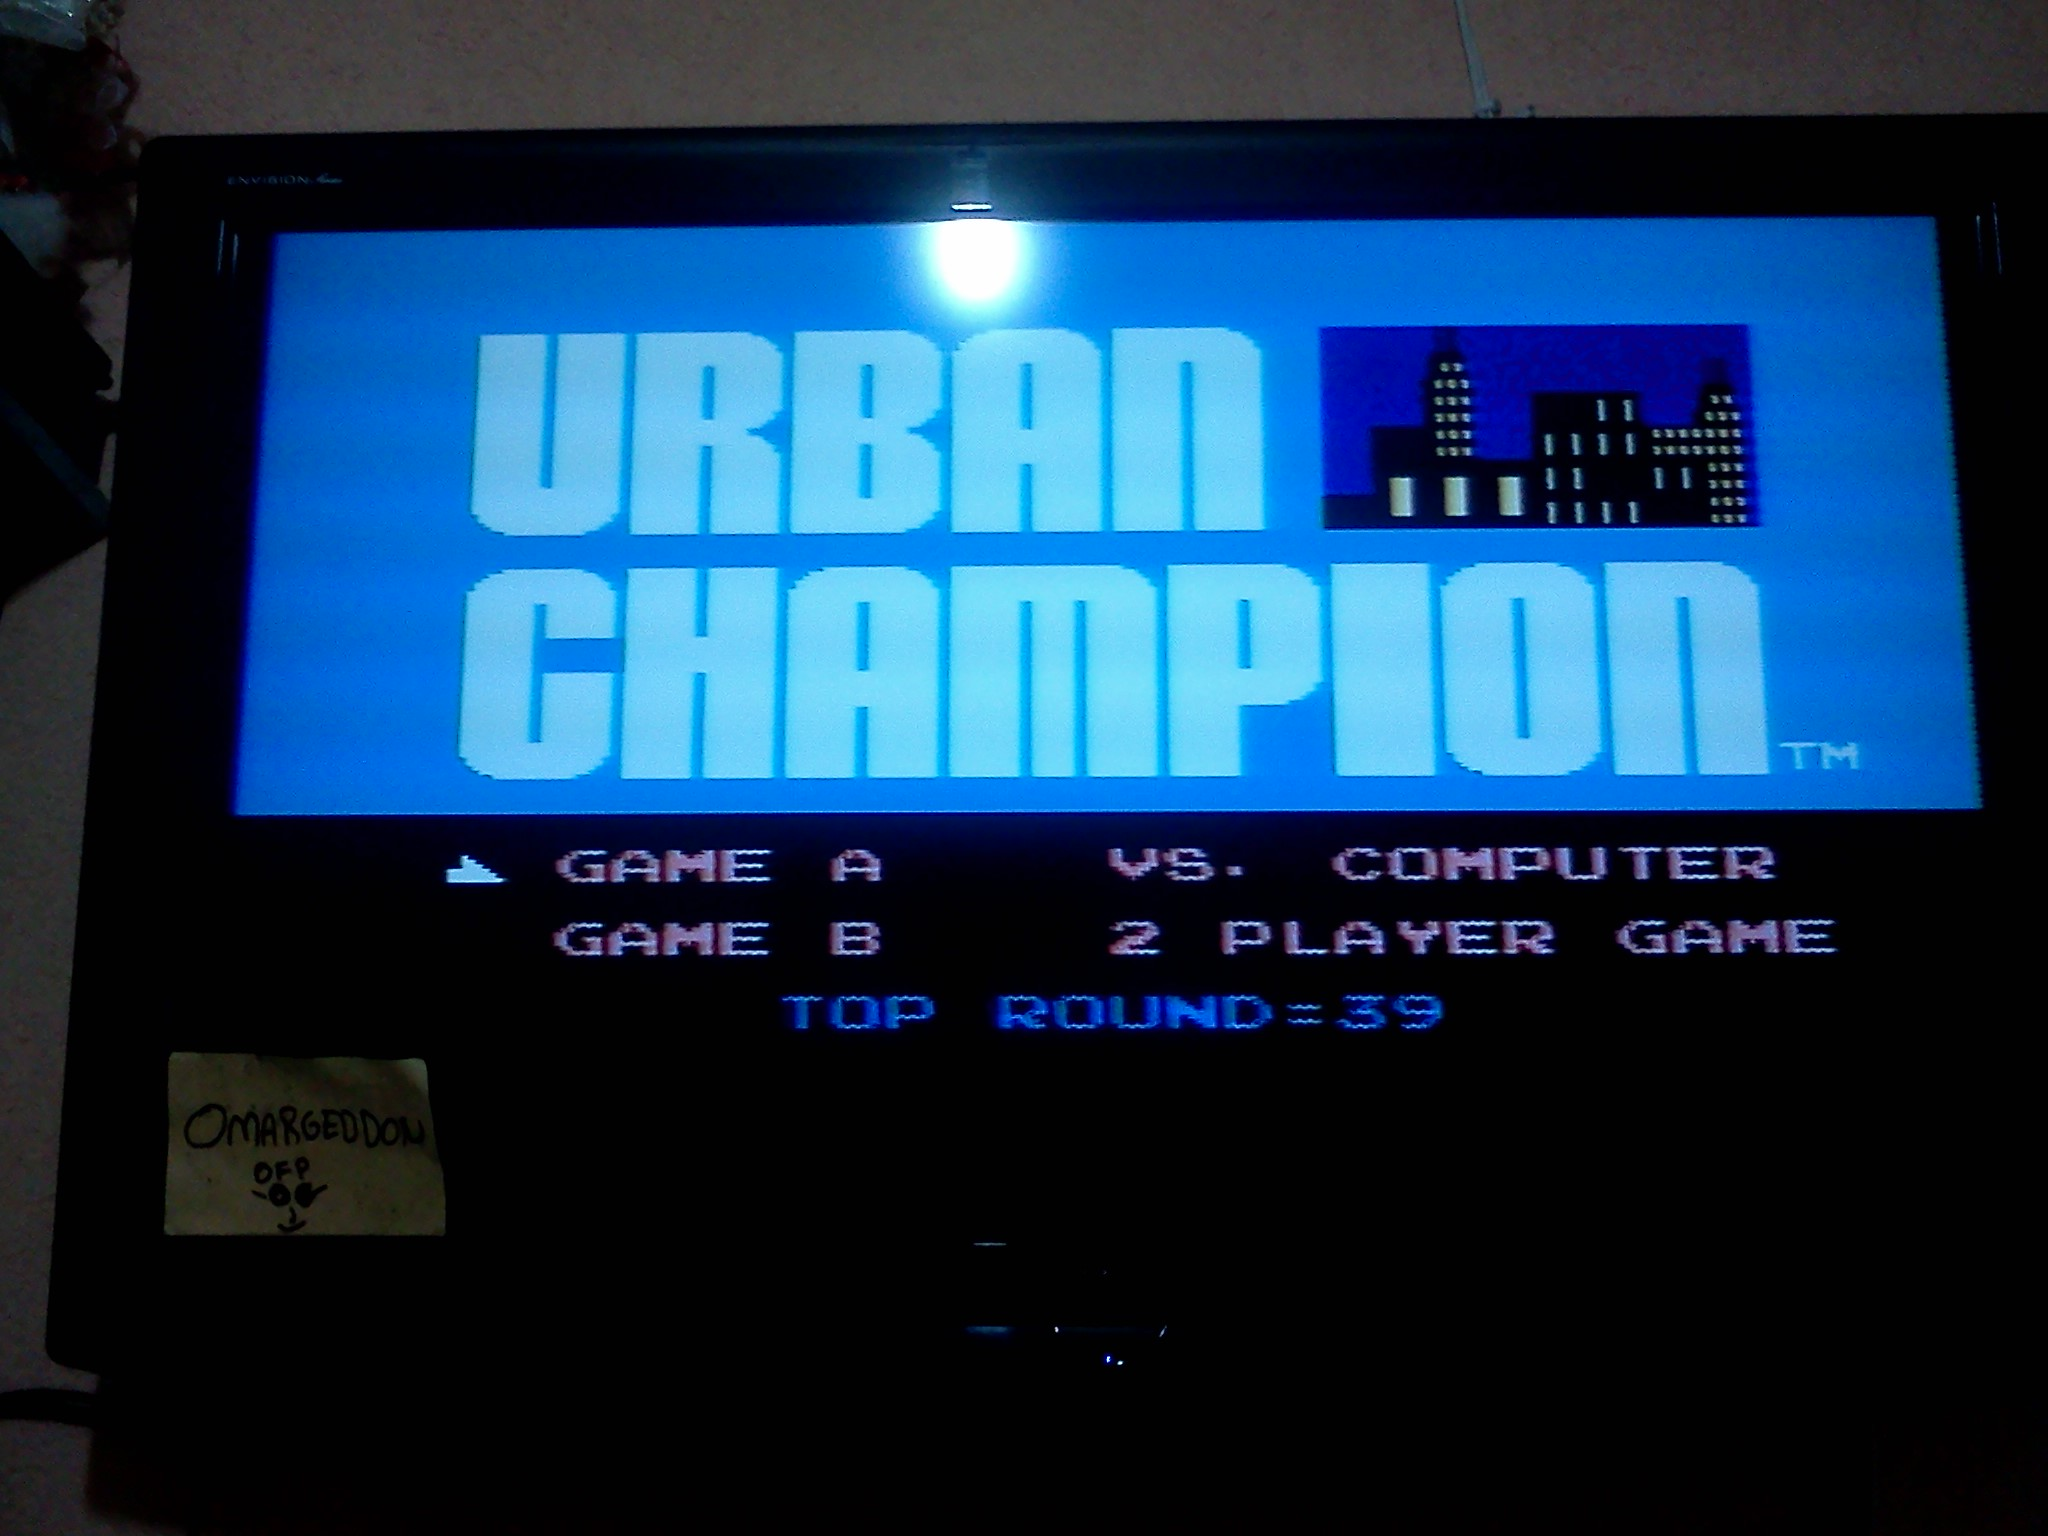 Urban Champion: Game A 39 points